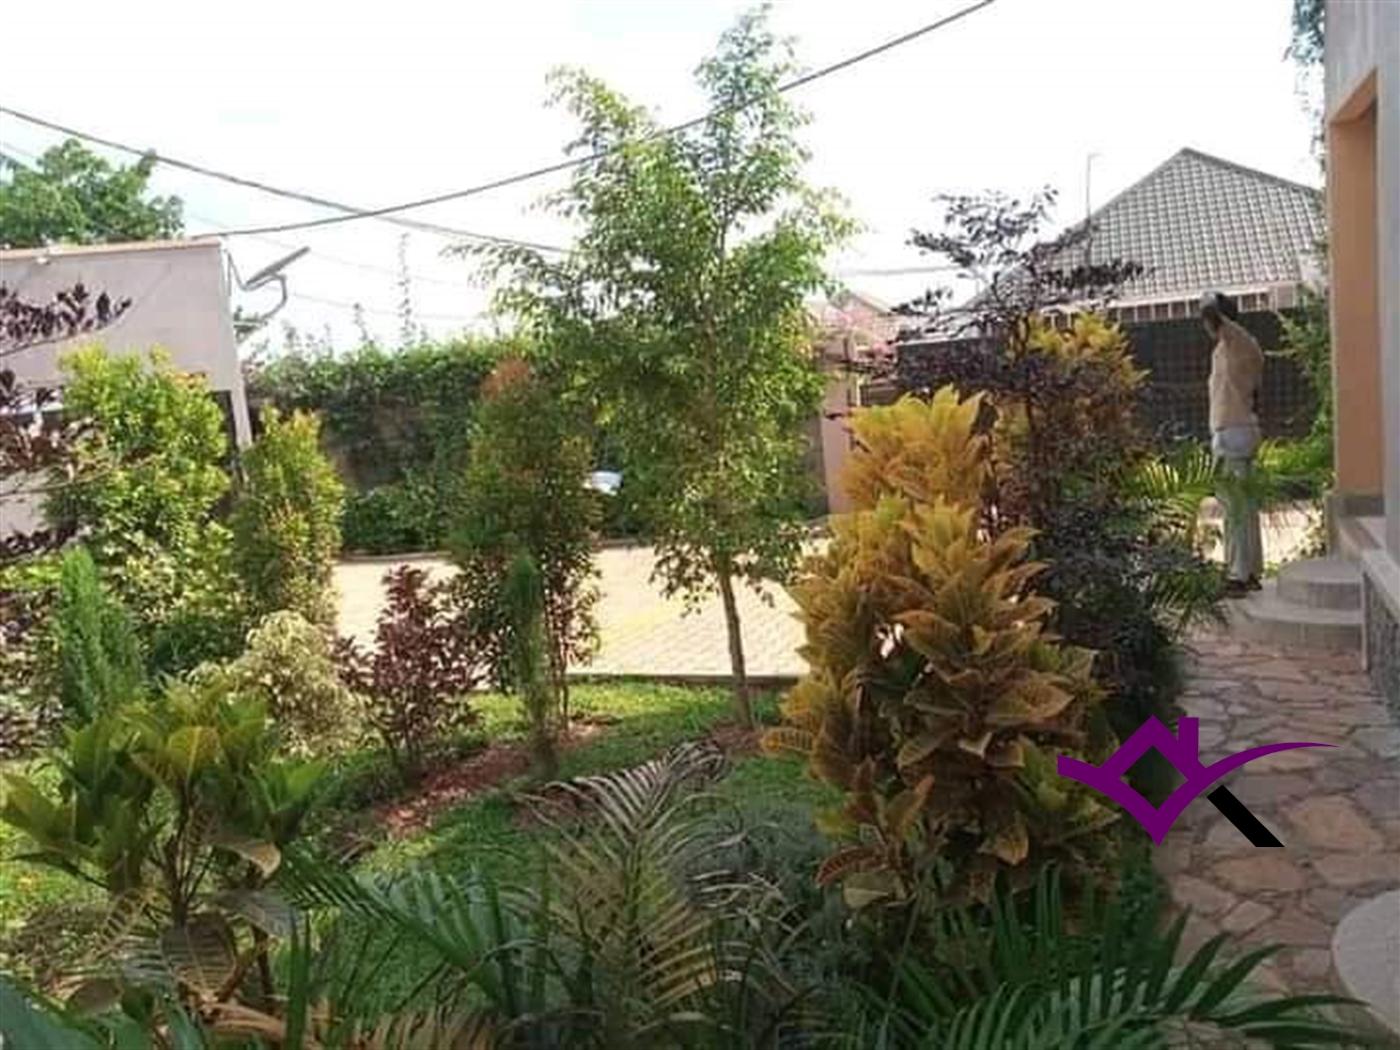 Vacation rental for sale in Kitala Wakiso